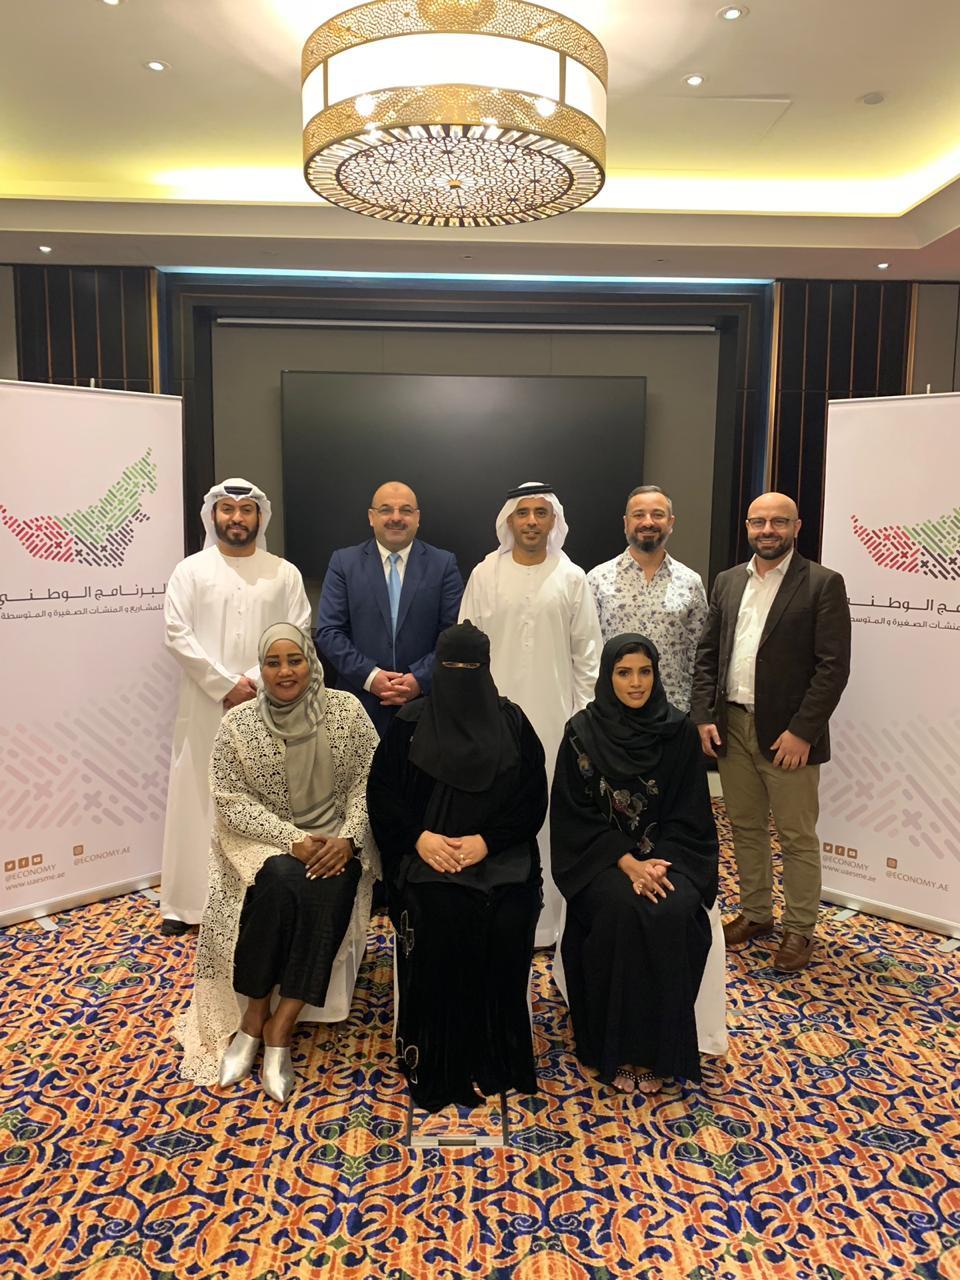 API-Smes-UAE-2019.jpg